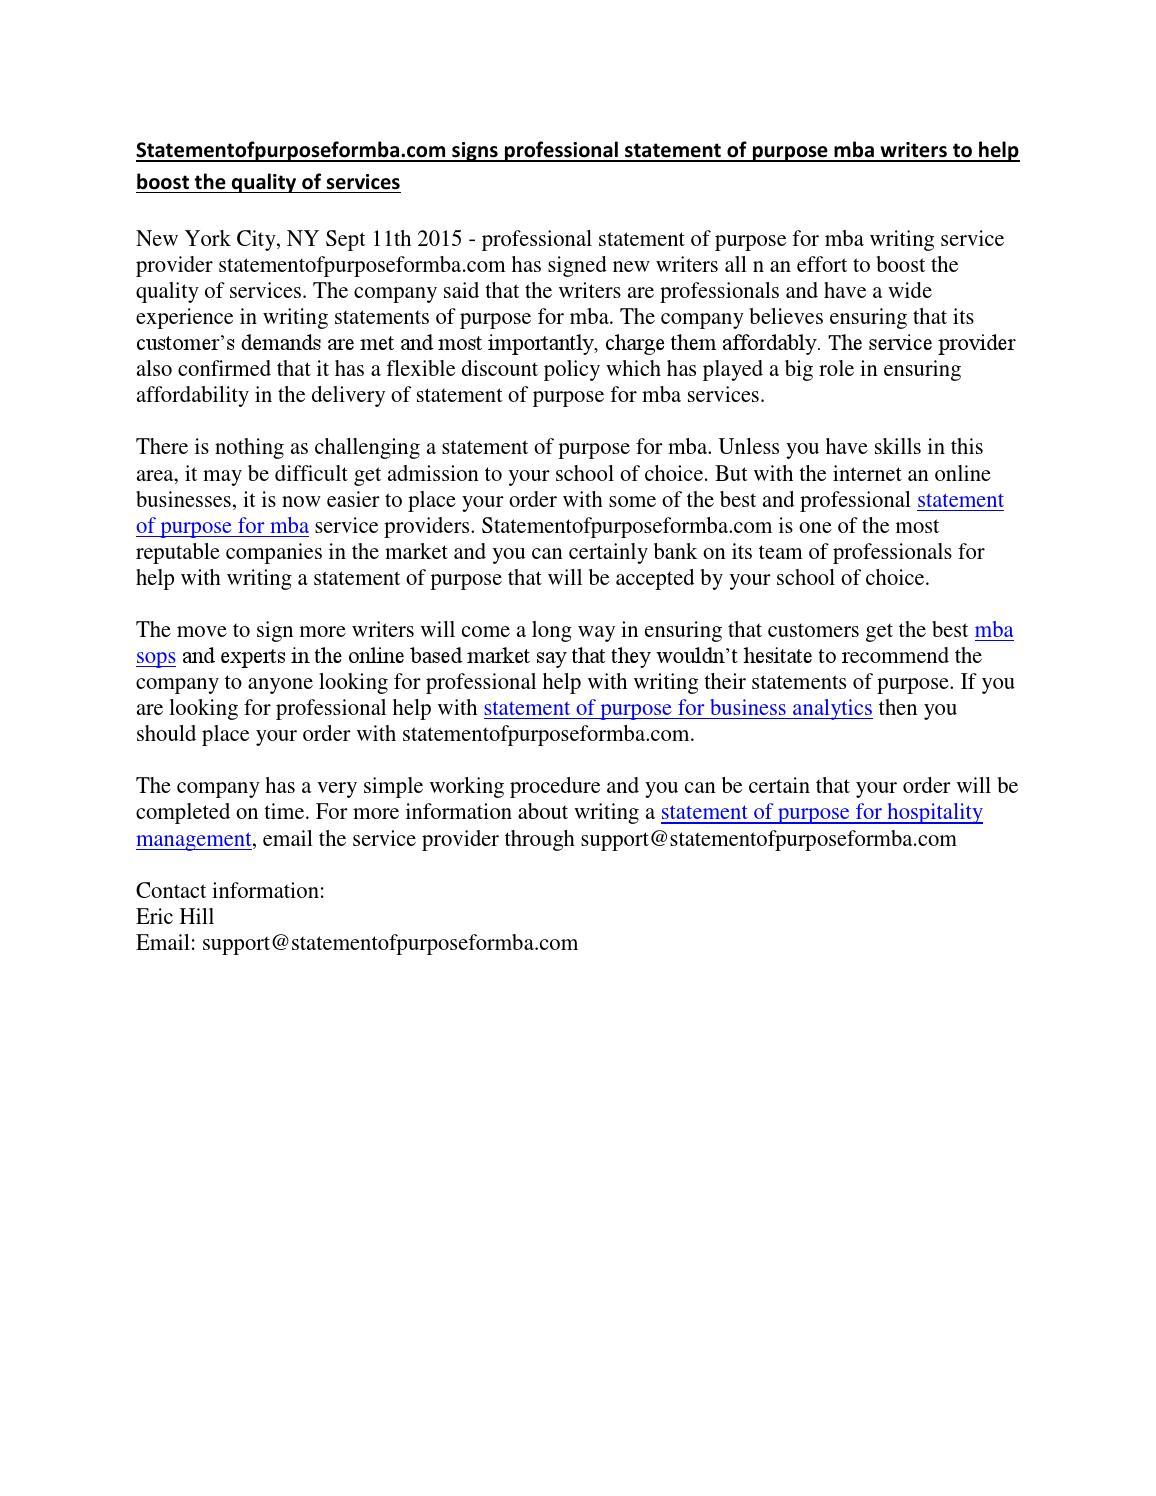 Statement of purpose writing service